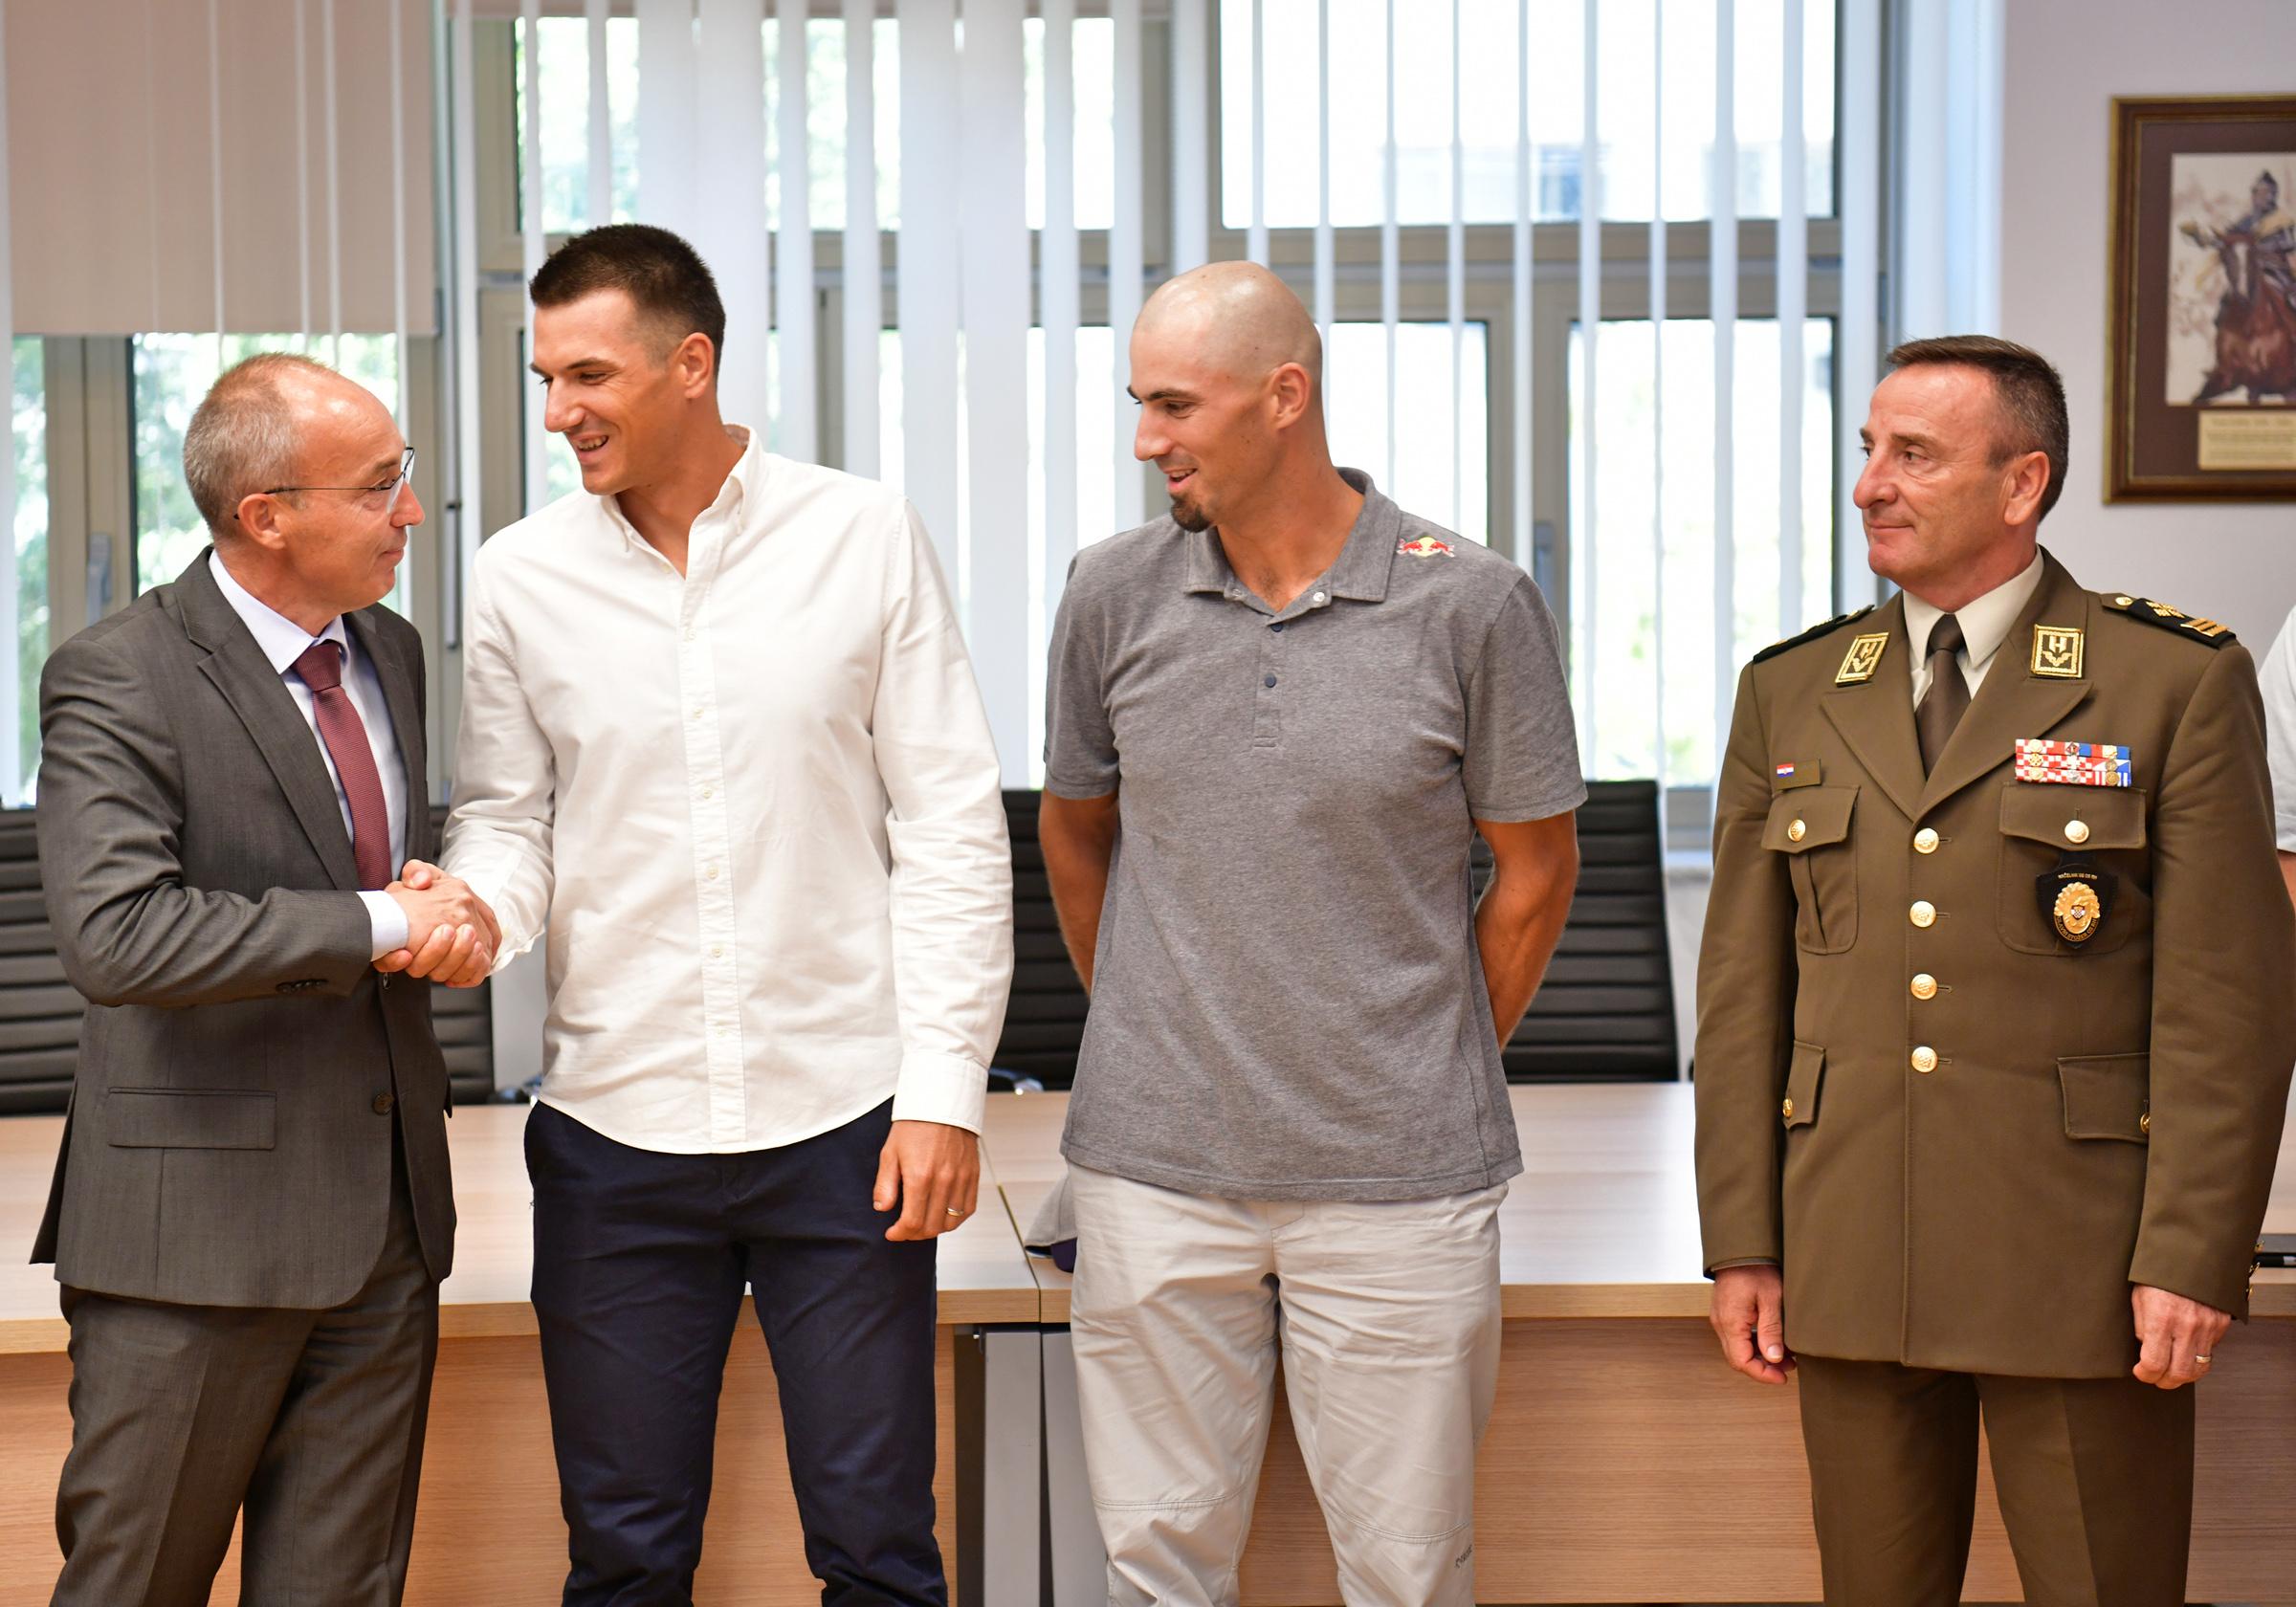 Ministar Krstičević i general Šundov s braćom Sinković